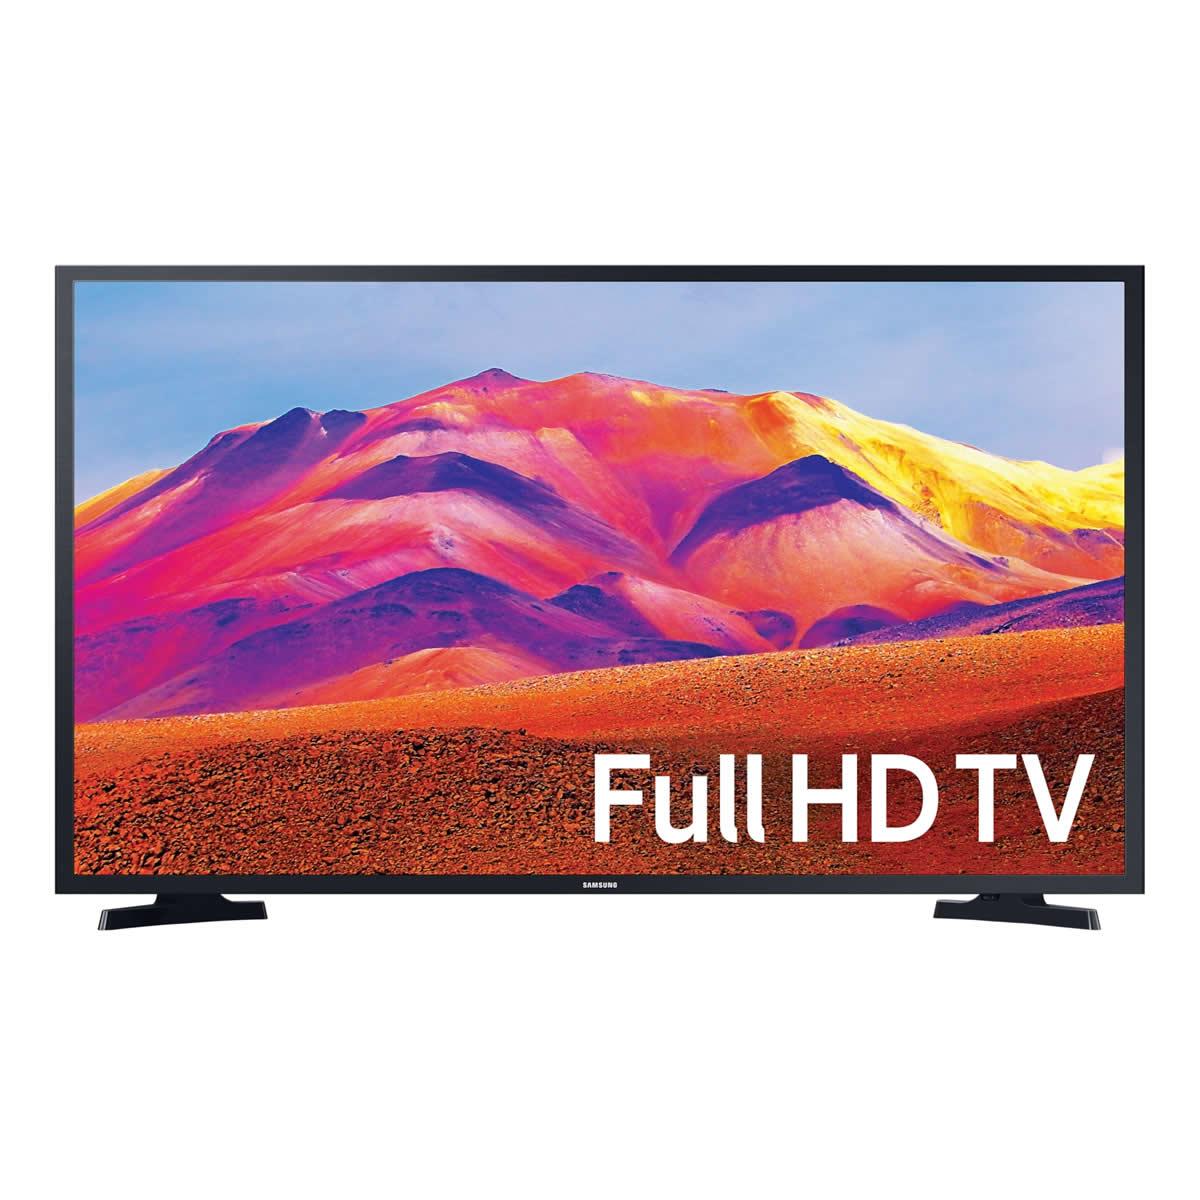 Samsung UE32T5300 (2020) LED HDR Full HD 1080p Smart TV, 32 inch with TVPlus, Black